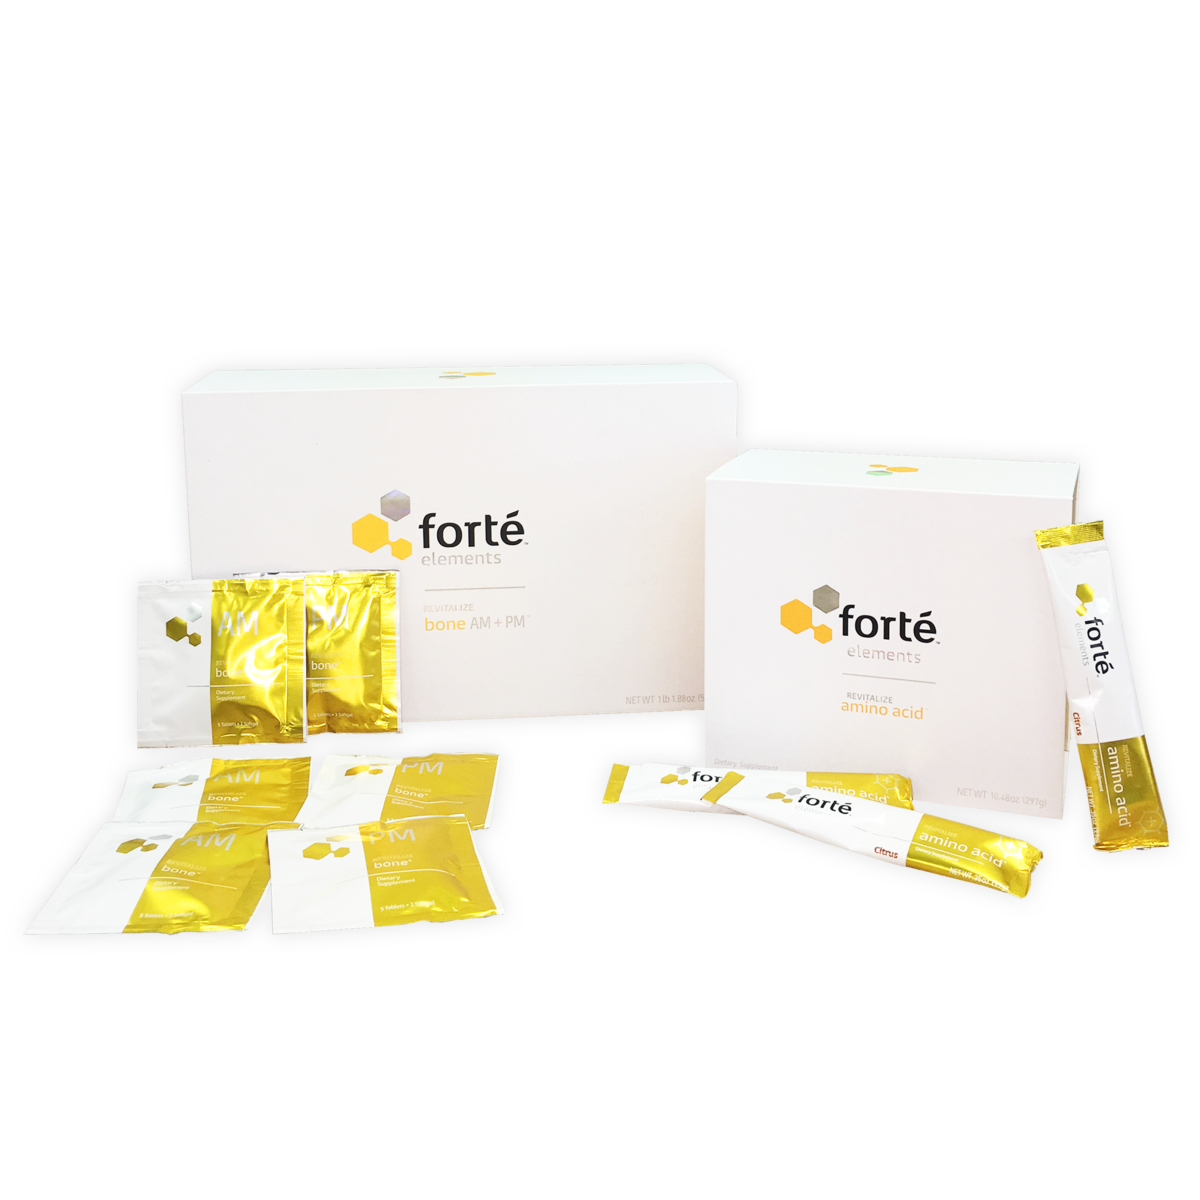 Bone and amino acid supplement bundle yellow packaging